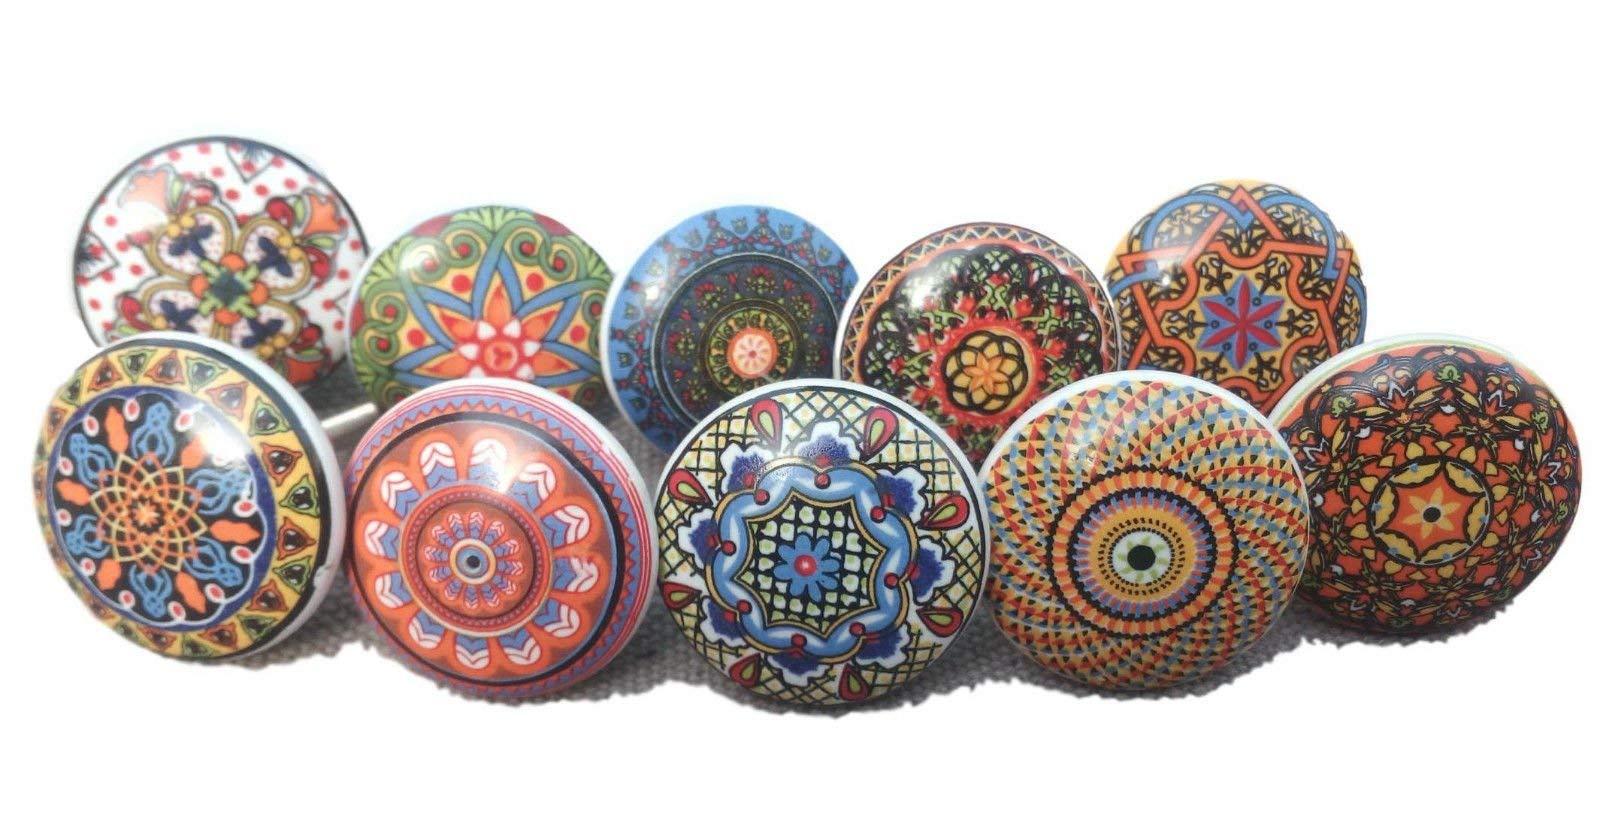 10 x Mix Vintage Look Flower Ceramic Knobs Door Handle Cabinet Drawer Cupboard Pull Mandala Xfer New